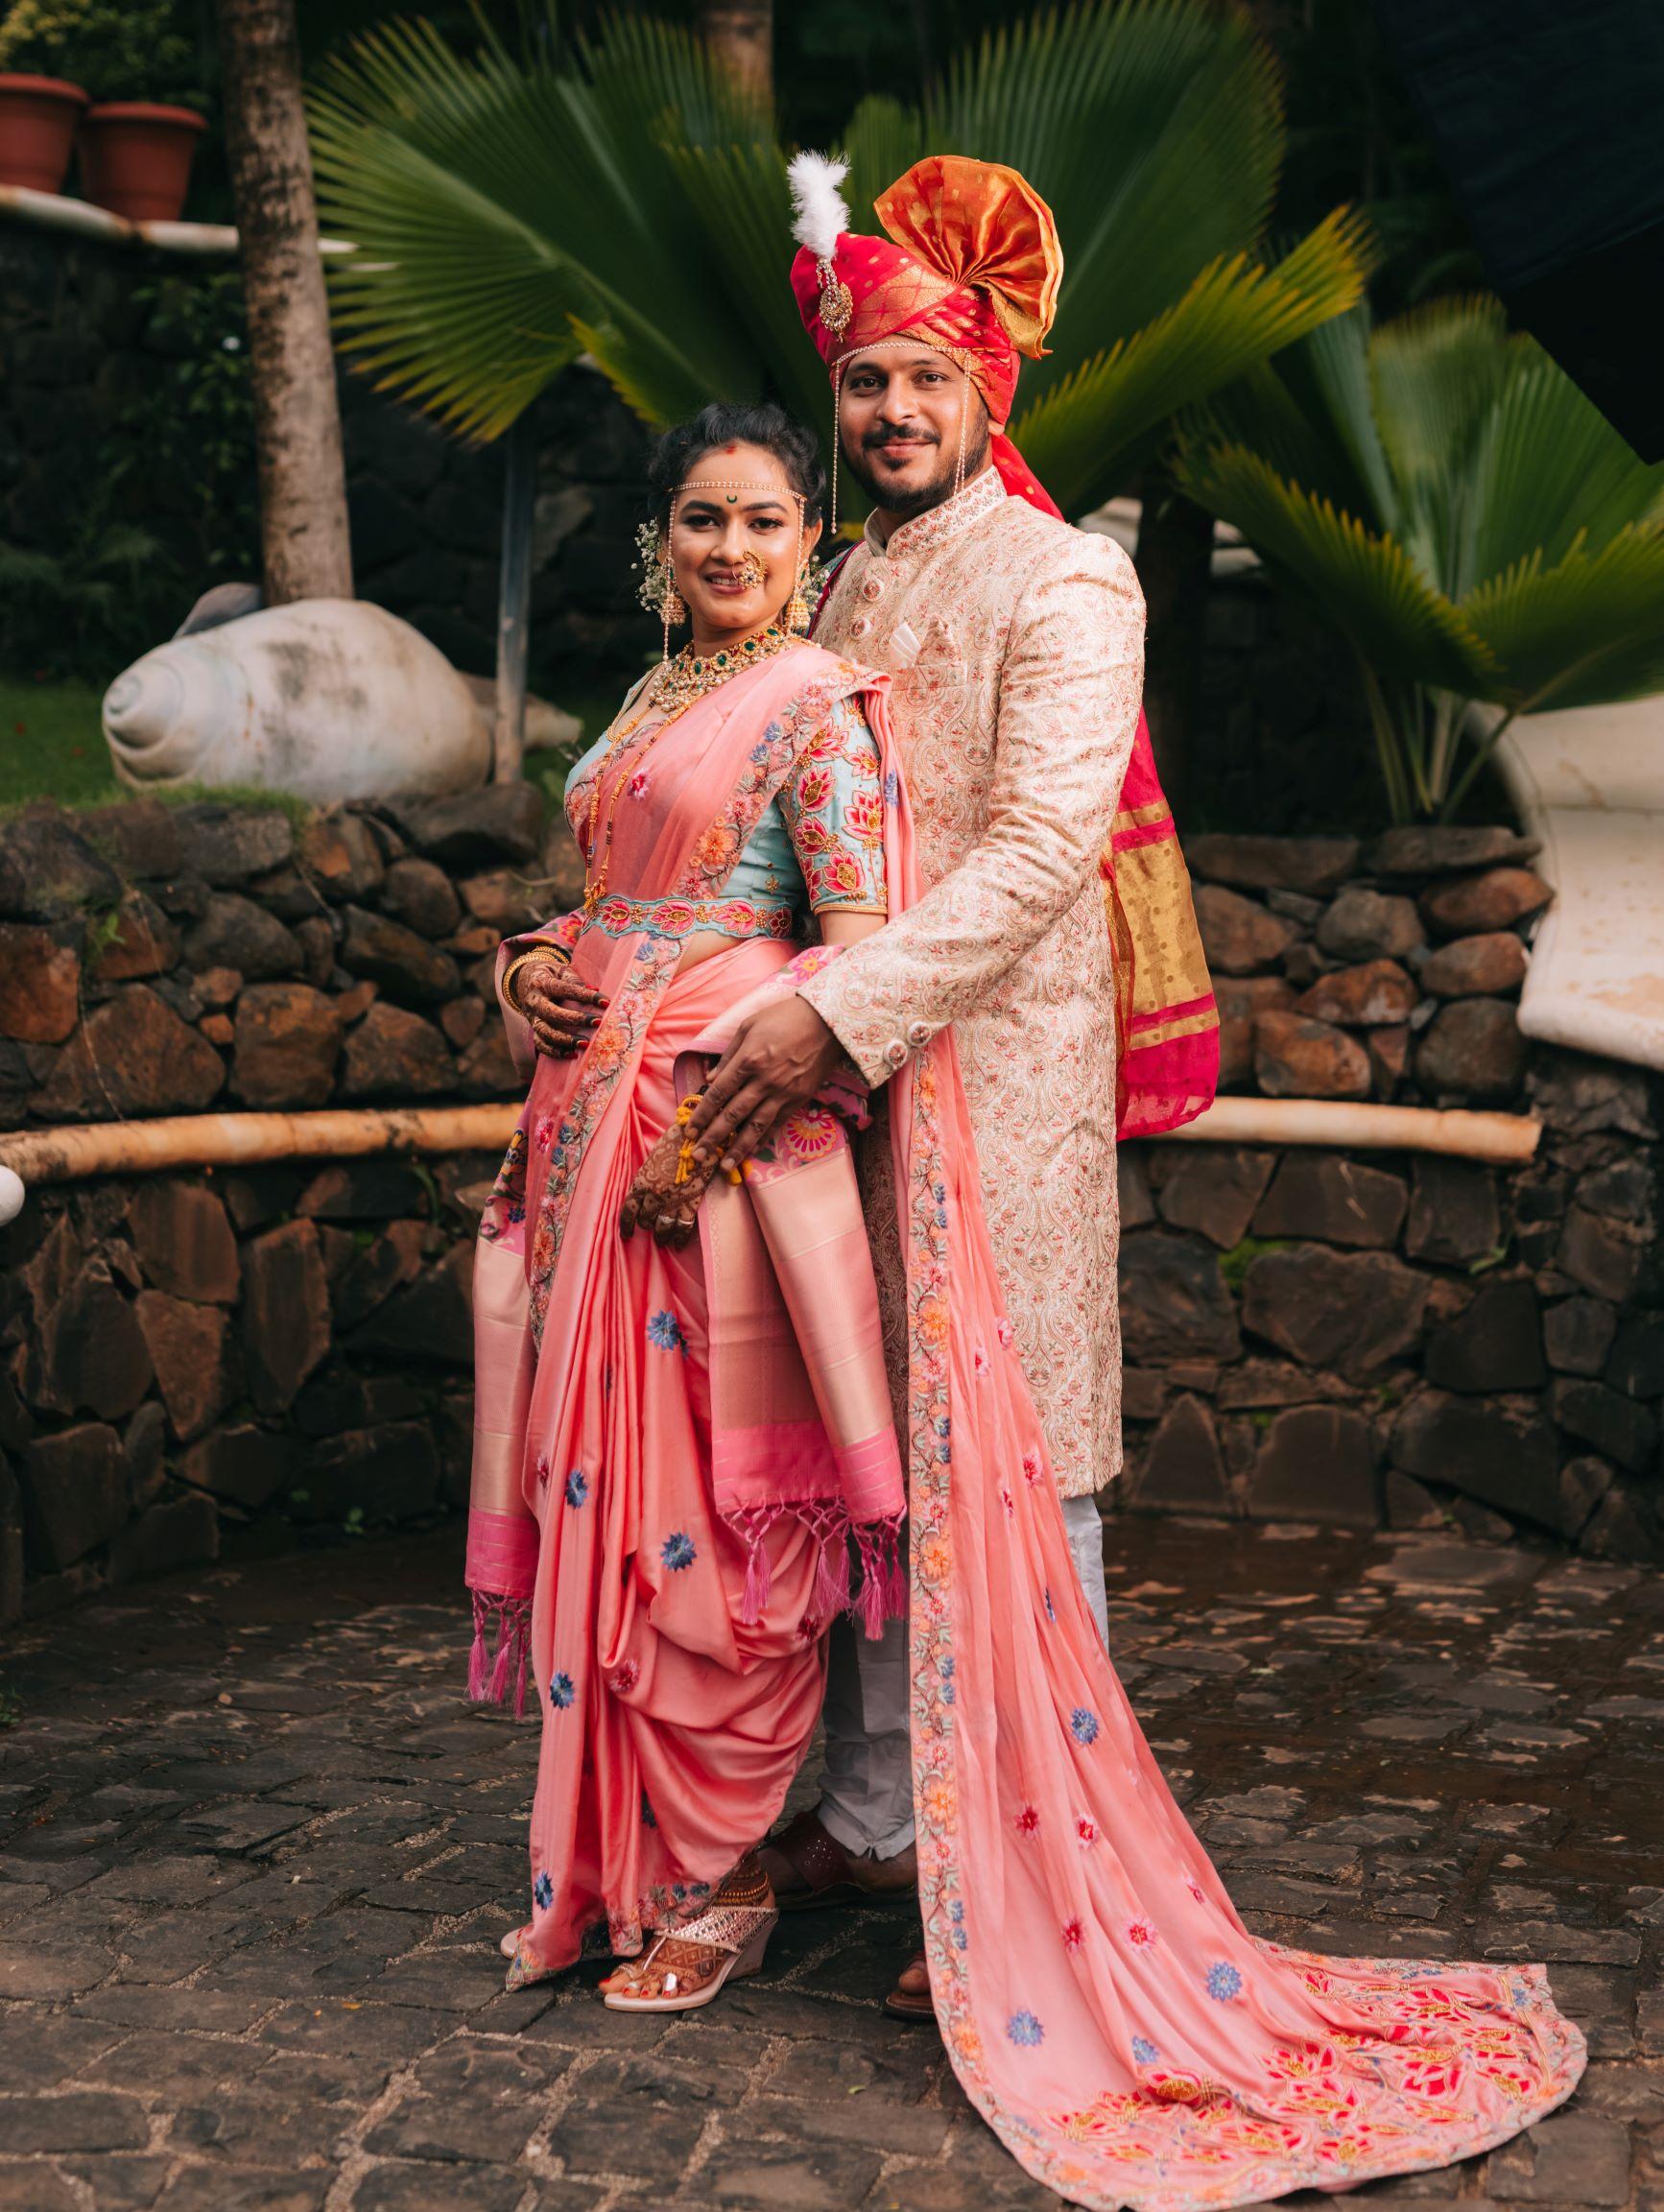 maharashtrian couple pose together at their wedding